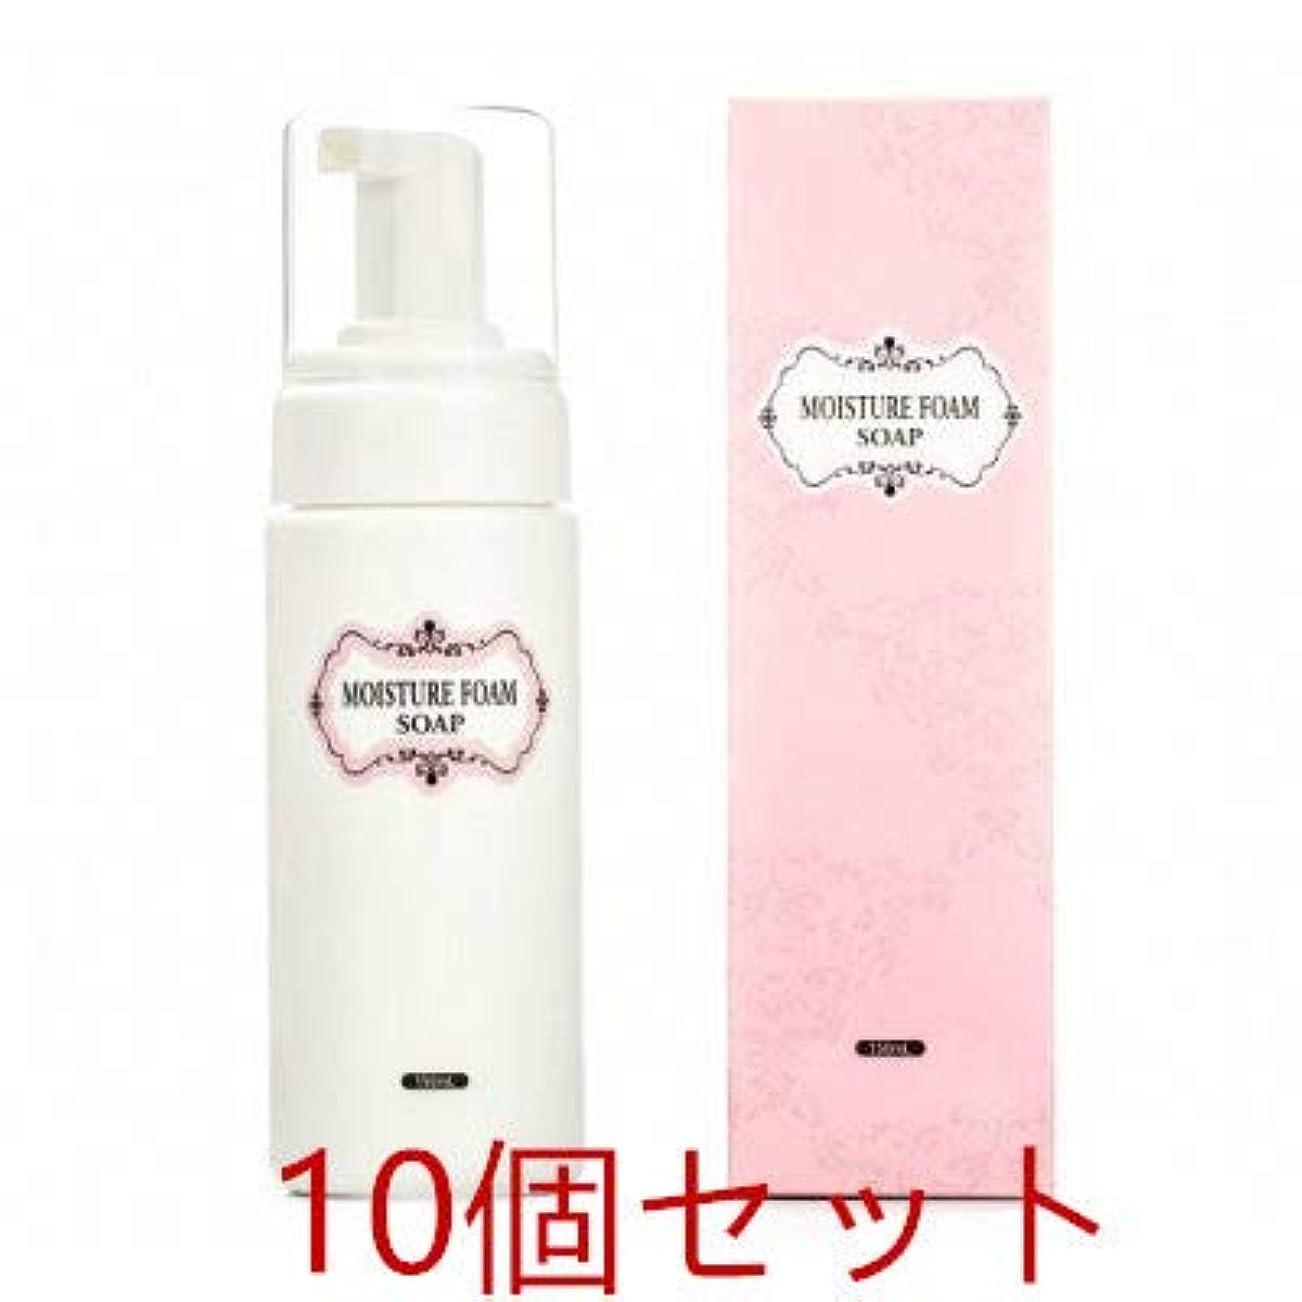 MOISTURE FOAM SOAP(モイスチャーフォームソープ) 150ml10個セット